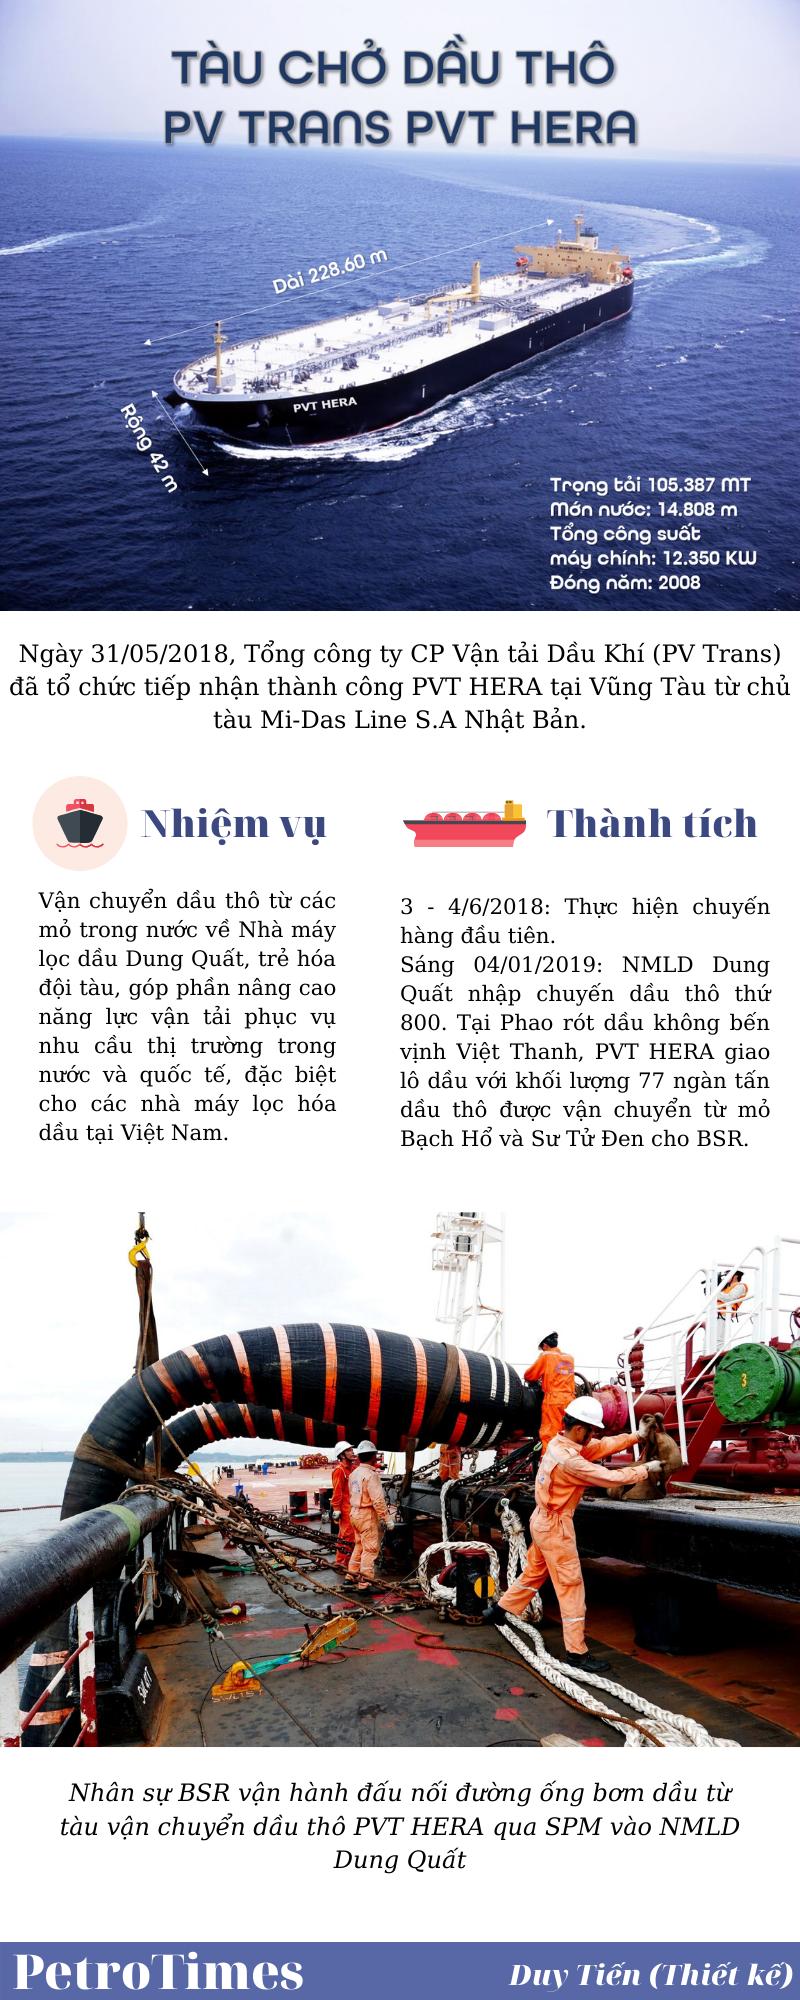 infographic pvt hera tau cho dau tho trong tai lon thu 2 o viet nam